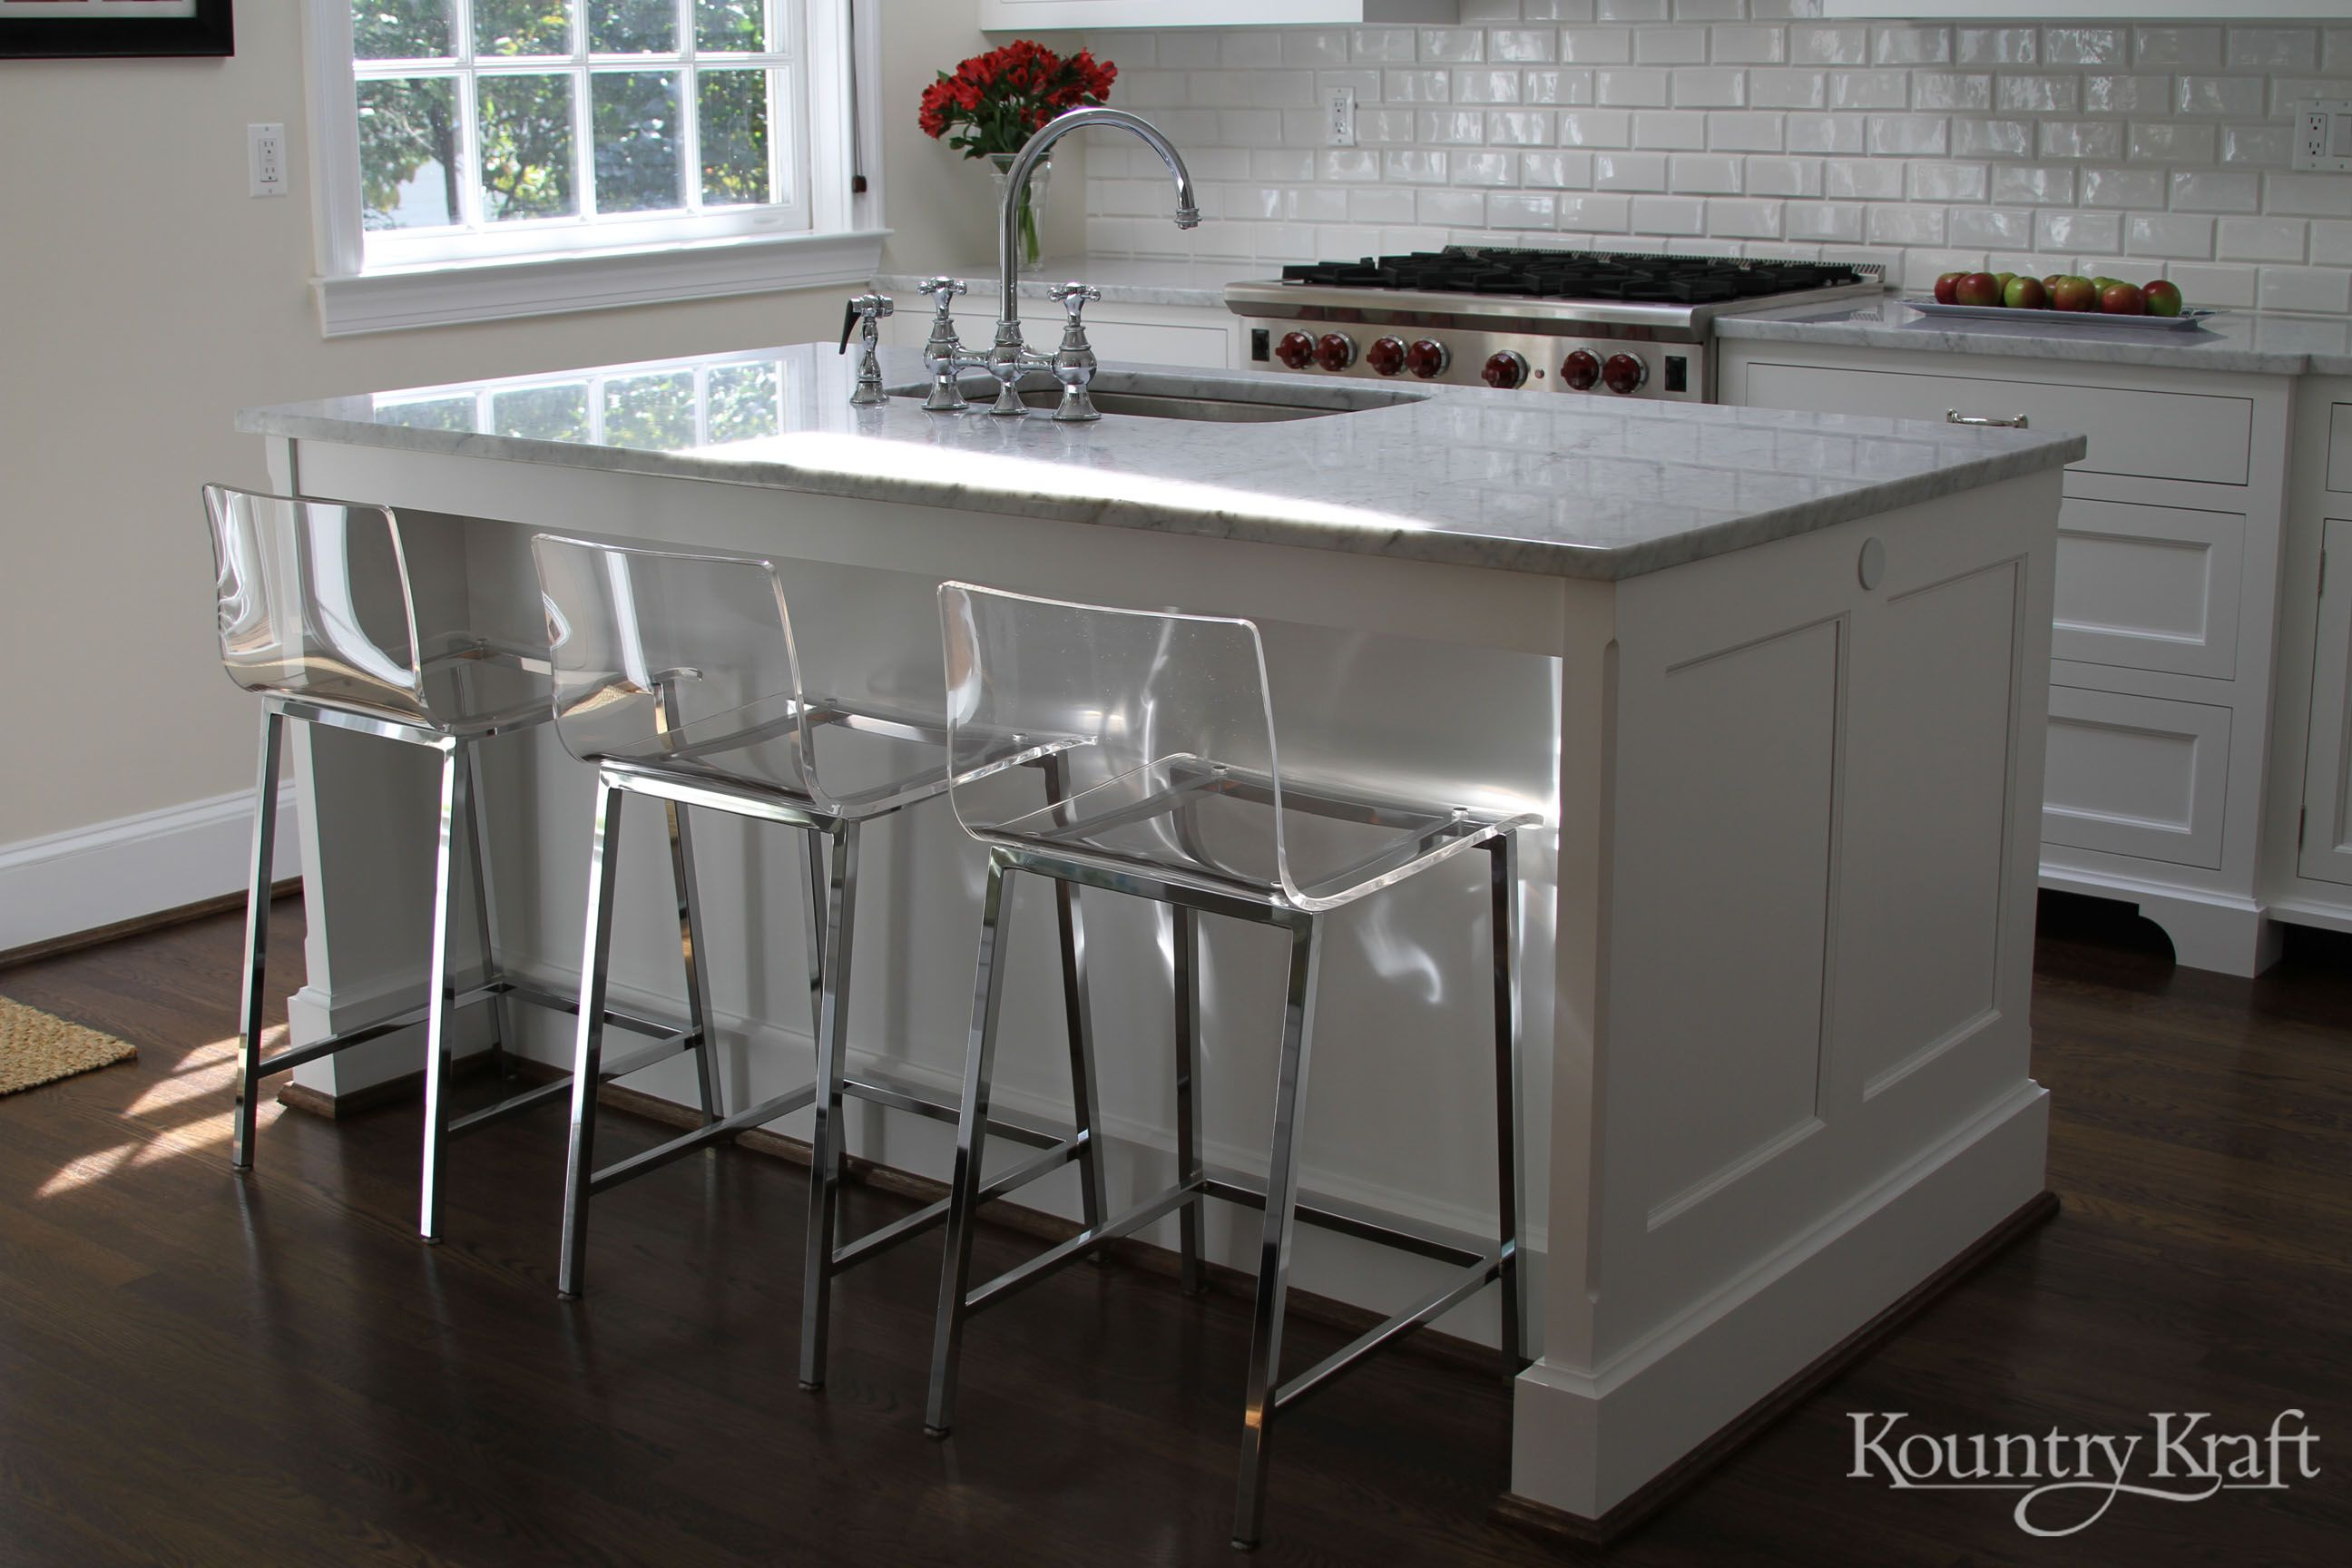 Custom Kitchen Cabinets Designed By Bradford Design Llc In Bethesda Md This Clas Custom Kitchen Cabinets Design Classic White Kitchen Custom Kitchen Cabinets